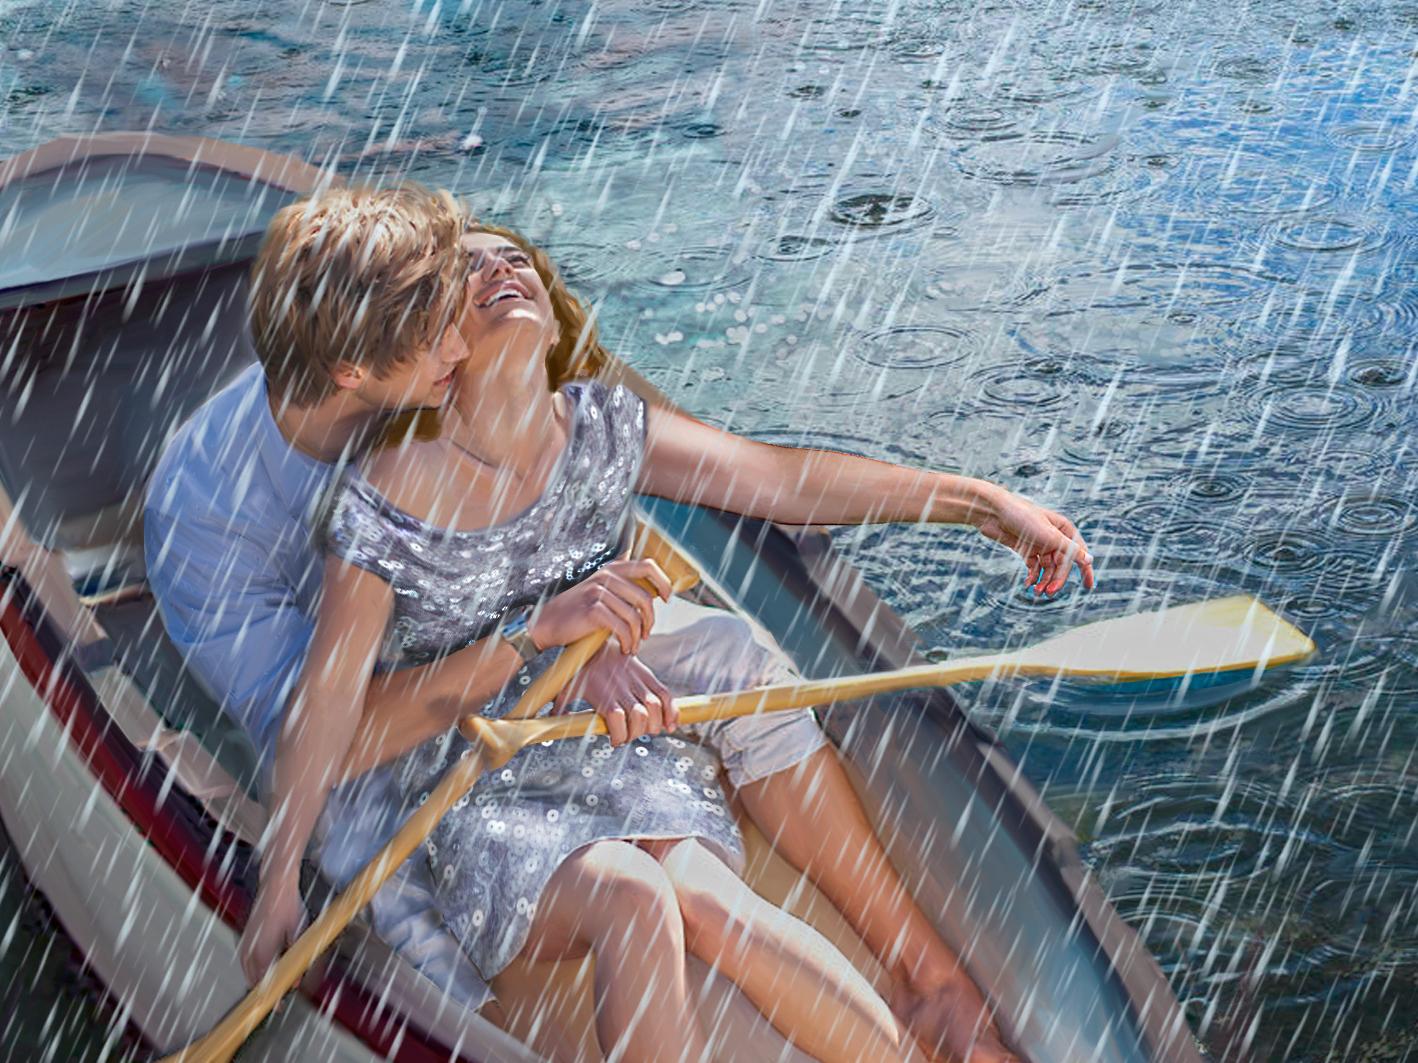 We do storyboarding love lovers relationship rainy river boat storyboard rain girl illustration